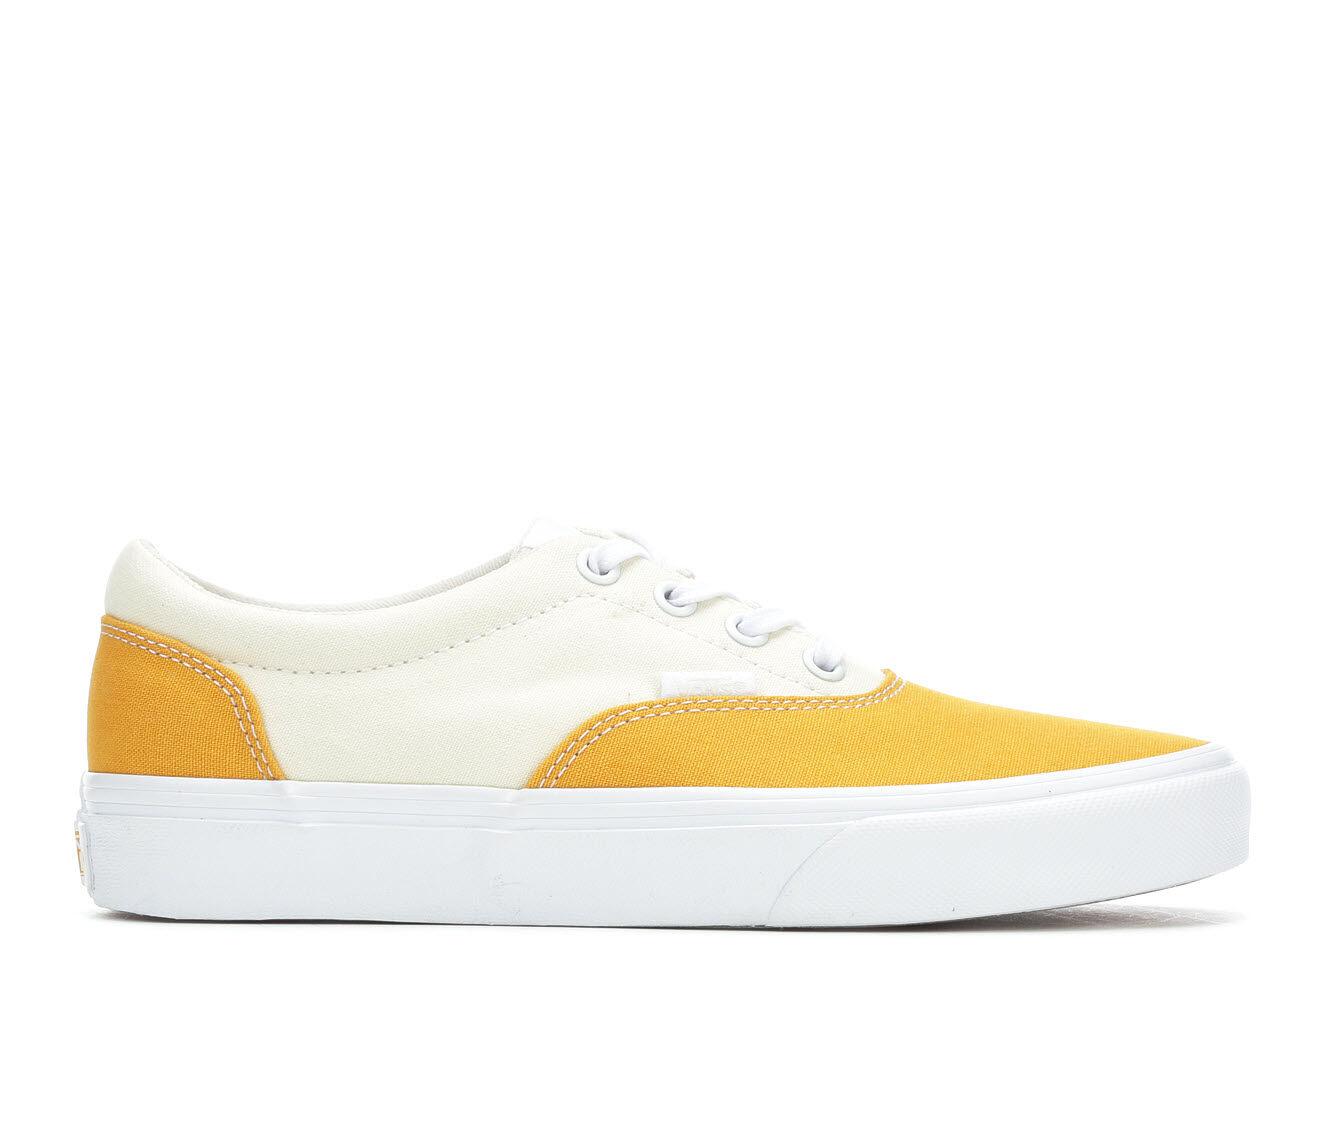 Women's Vans Doheny Two Tone Skate Shoes Mango/White